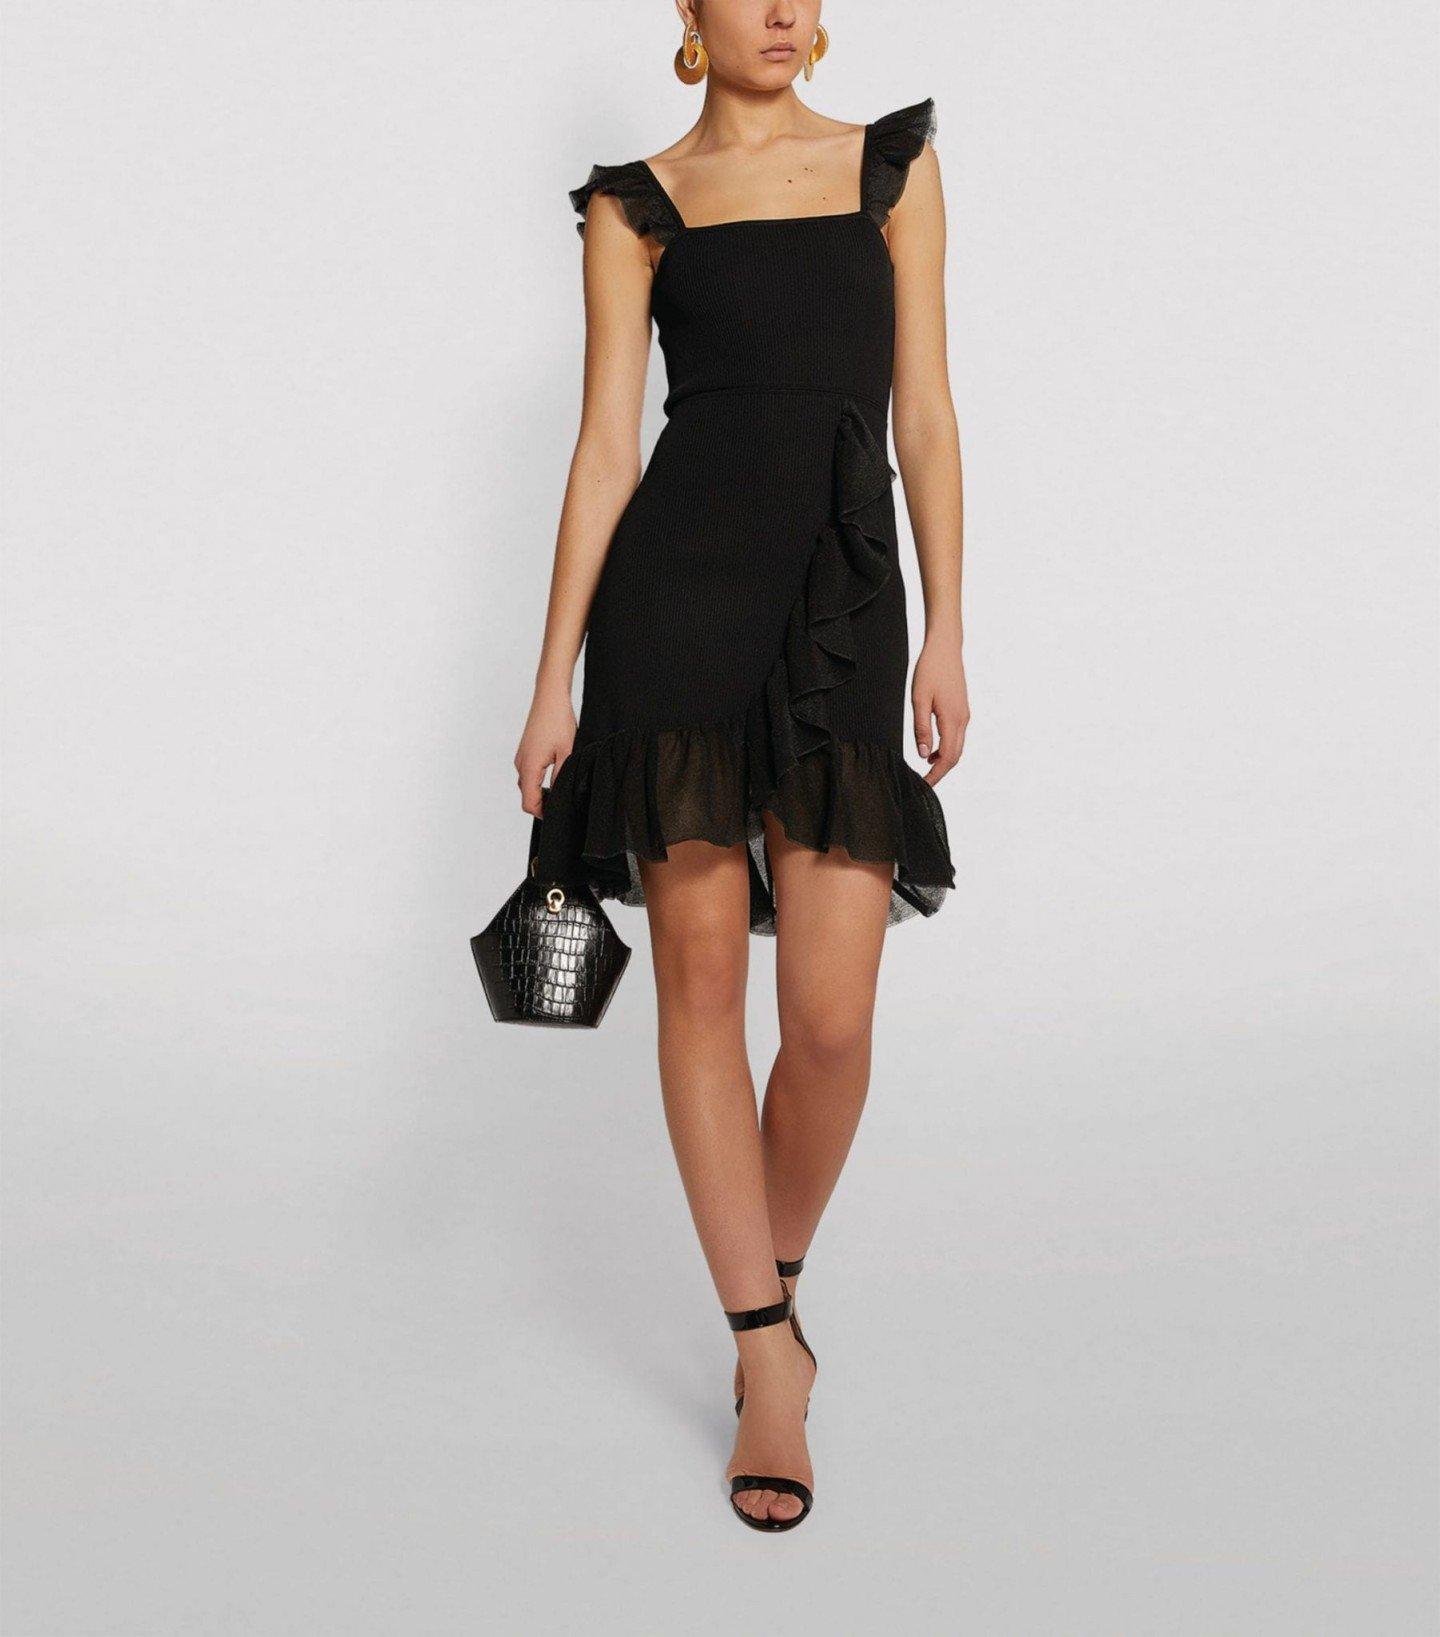 SANDRO PARIS Ruffle-Strap Knit Dress